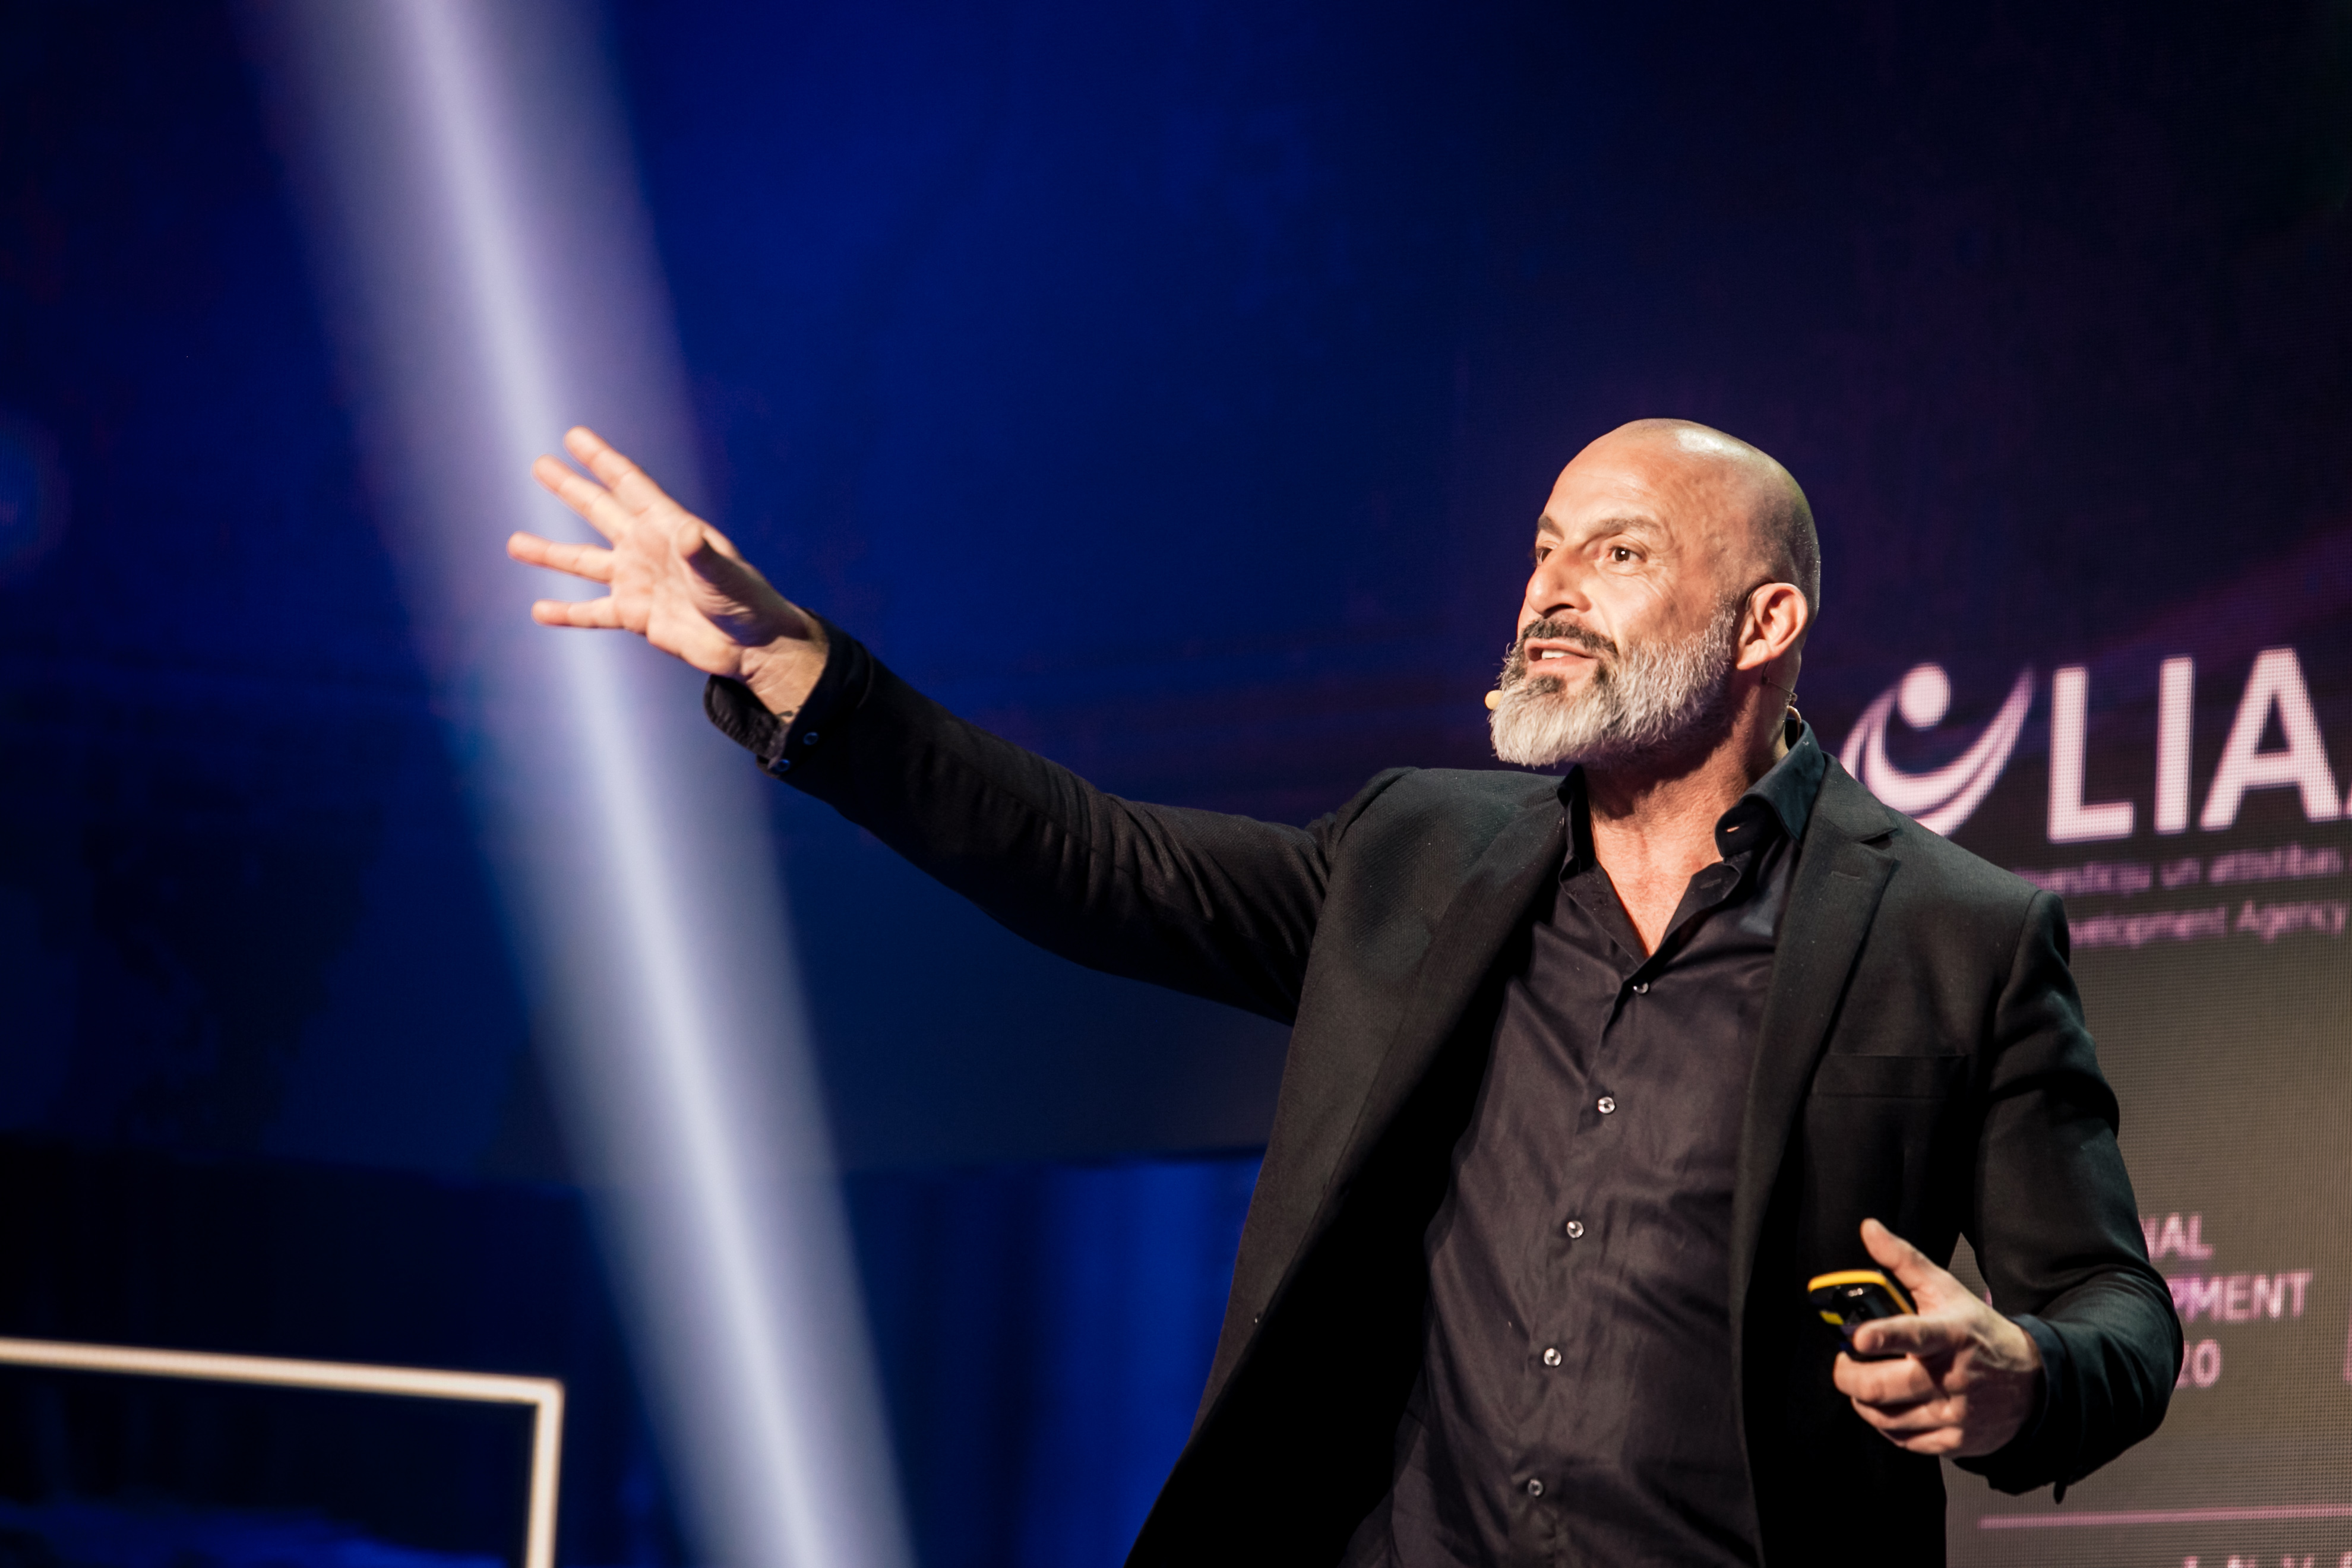 marketing innovation speaker igor beuker - coolbrands interview